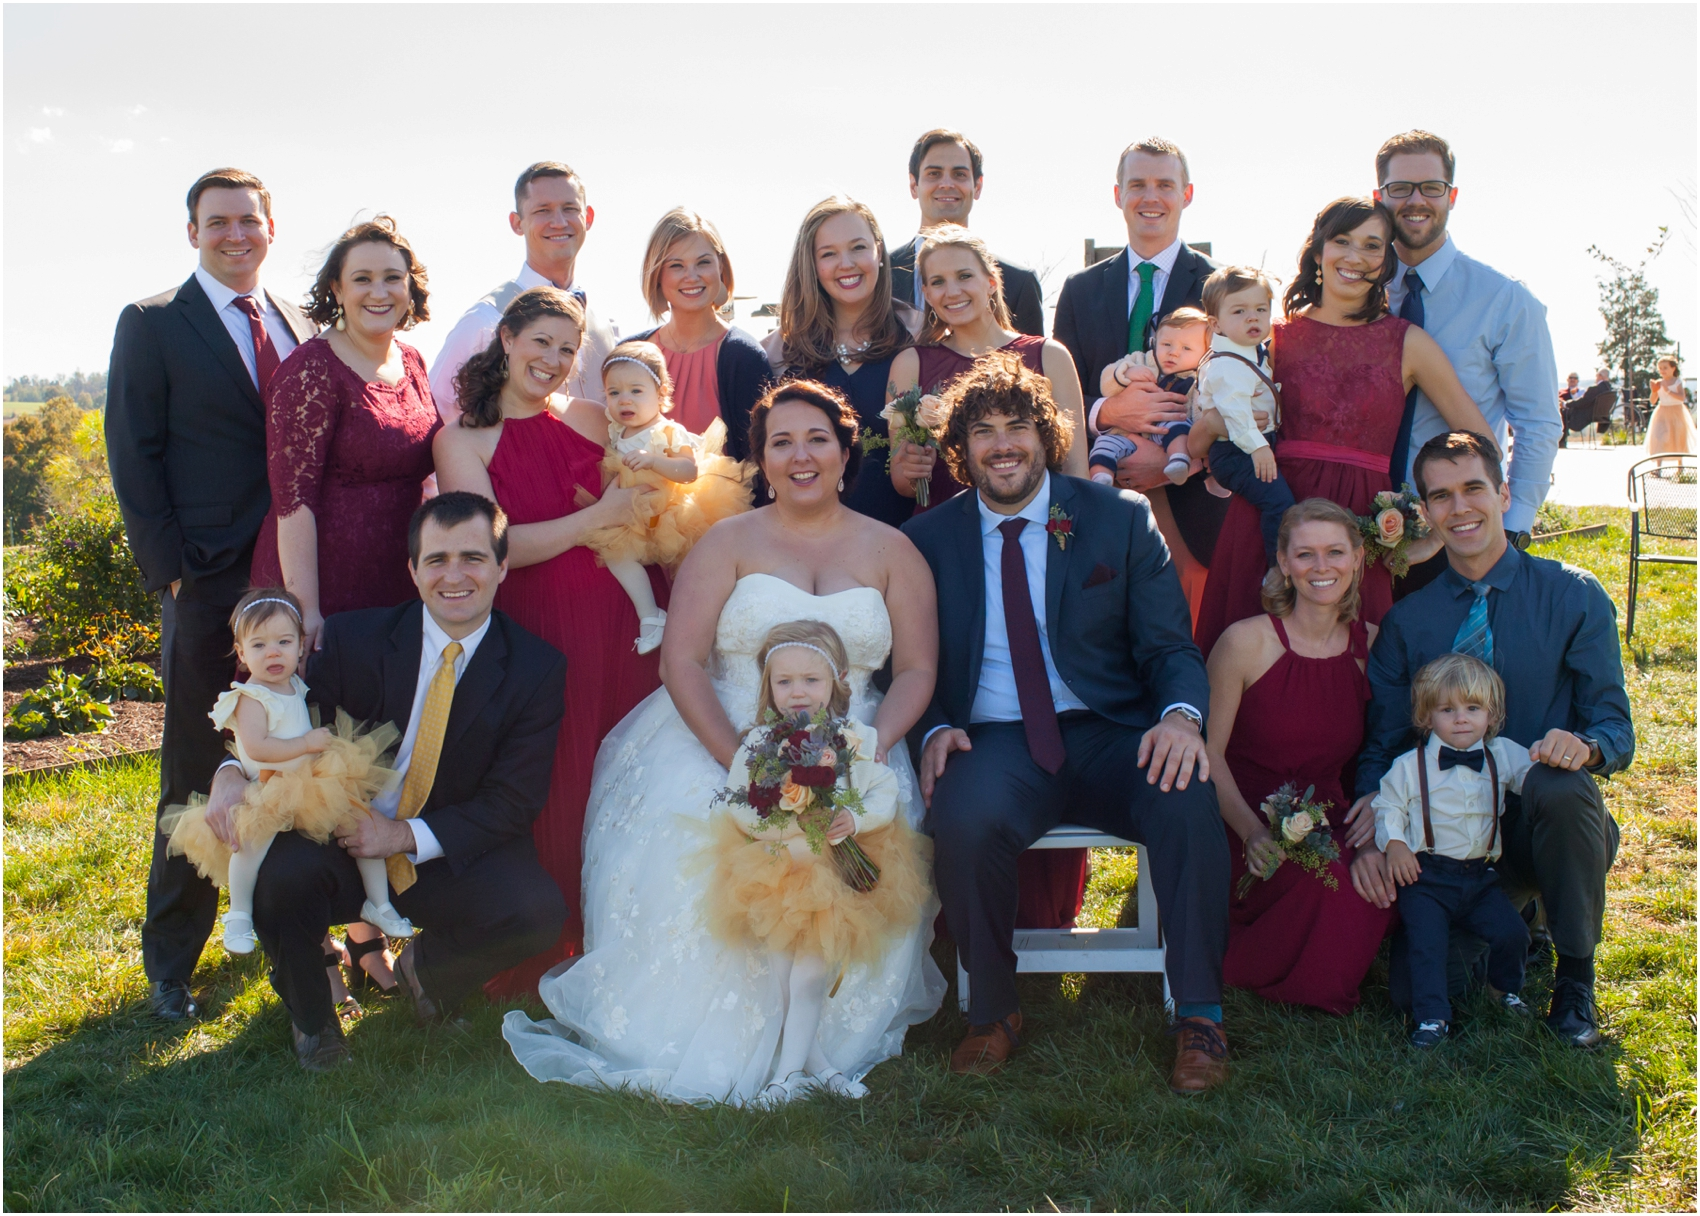 On-Sunny-Slope-Farm-Fall-Virginia-Wedding-2351.jpg